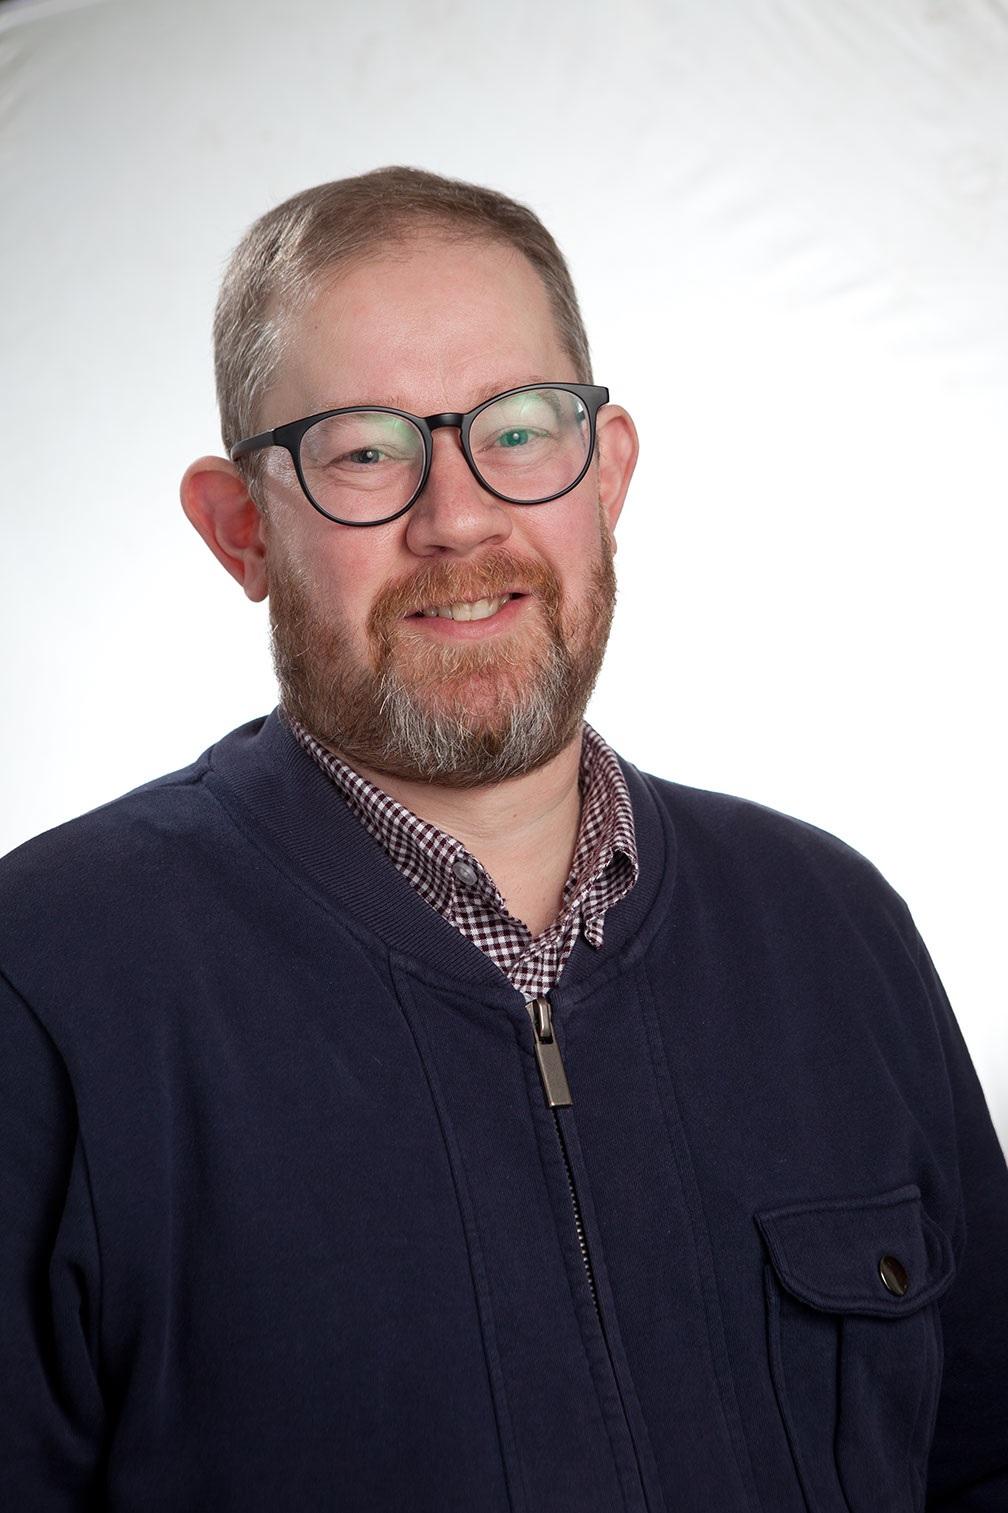 Mobile Library Manager Dean Audsley